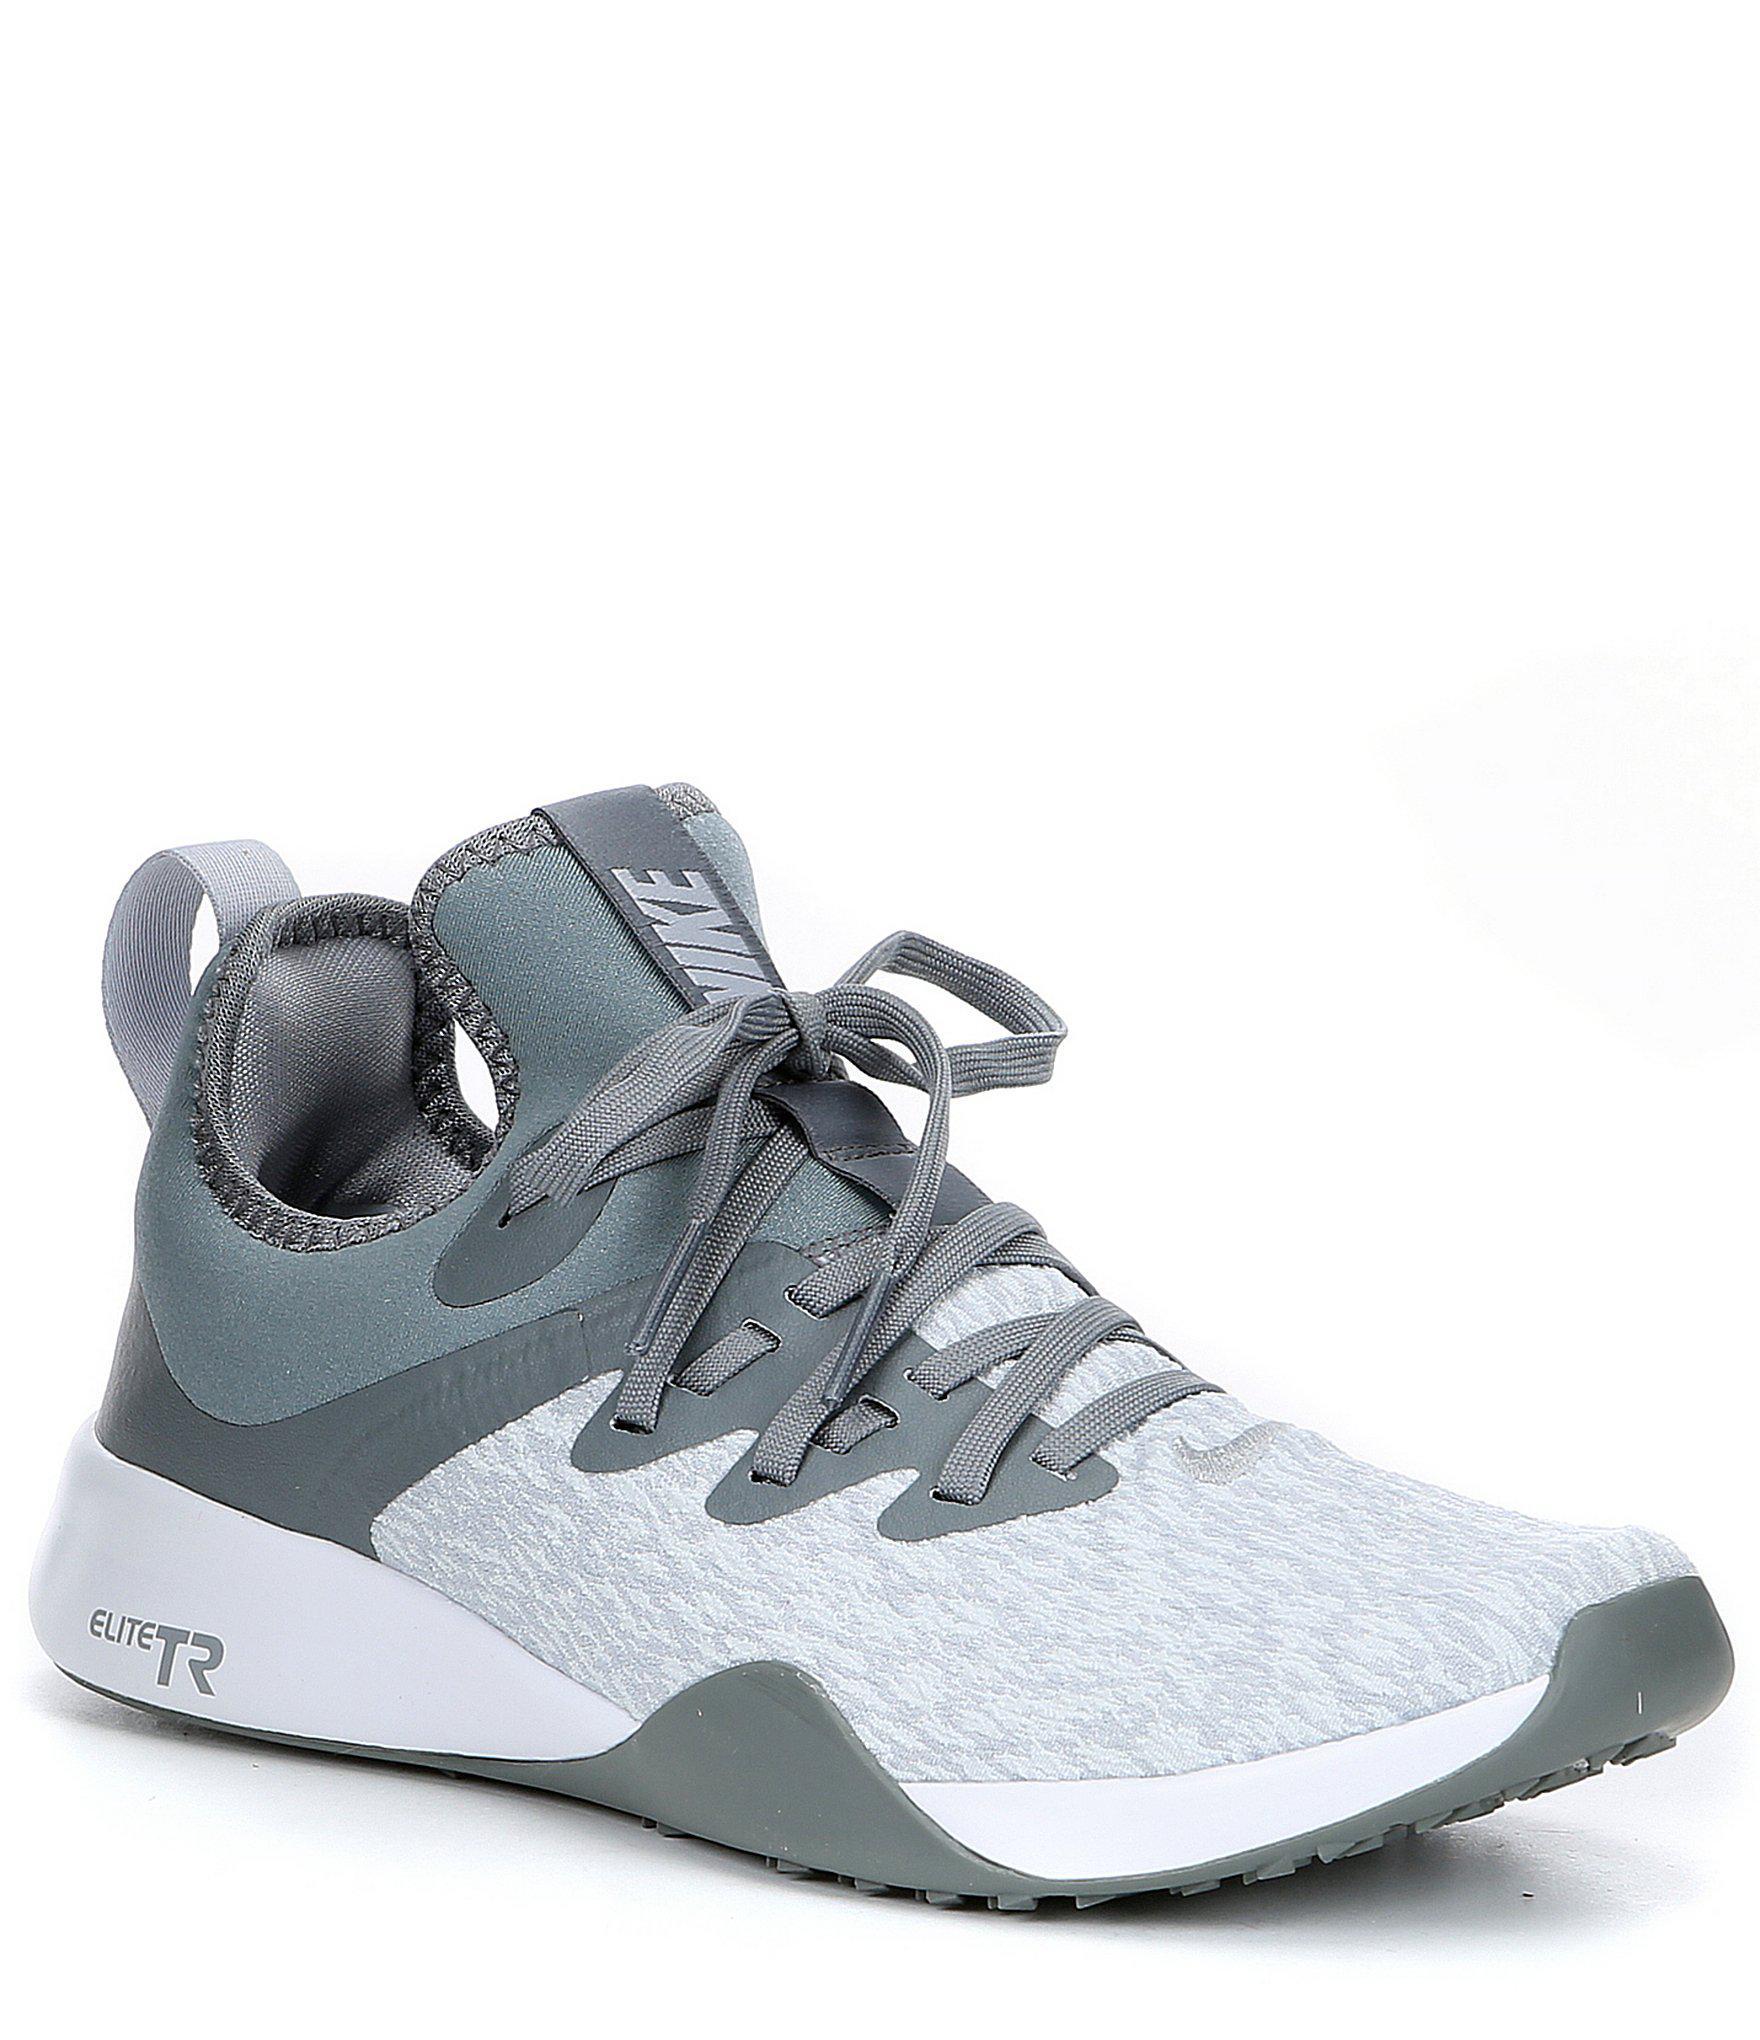 c8ff6c606 Nike Women's Foundation Elite Tr Training Shoe in Gray - Lyst